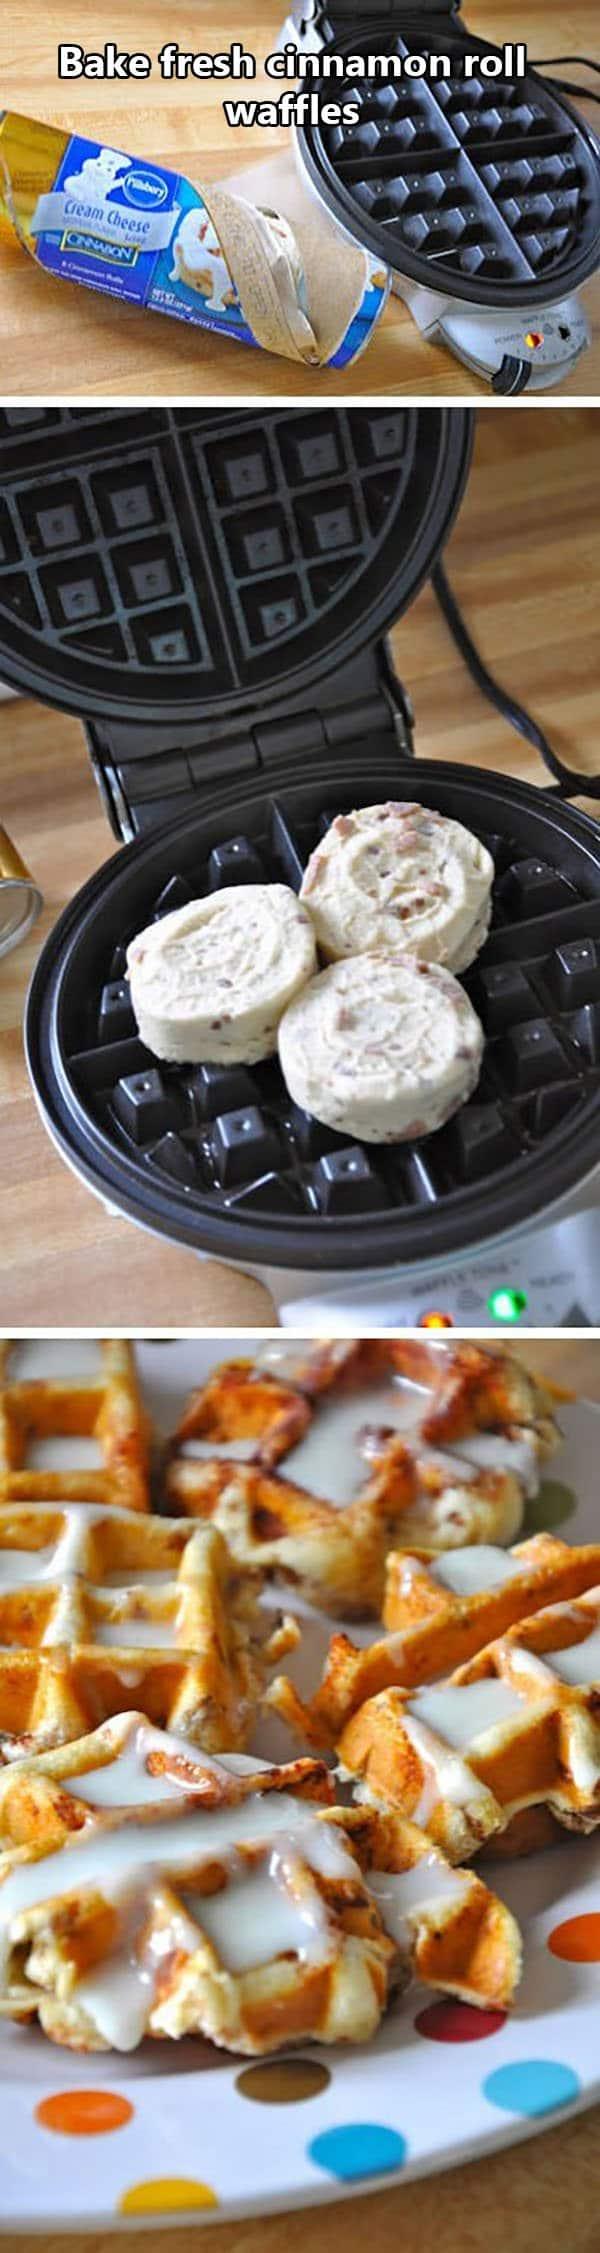 waffles hack